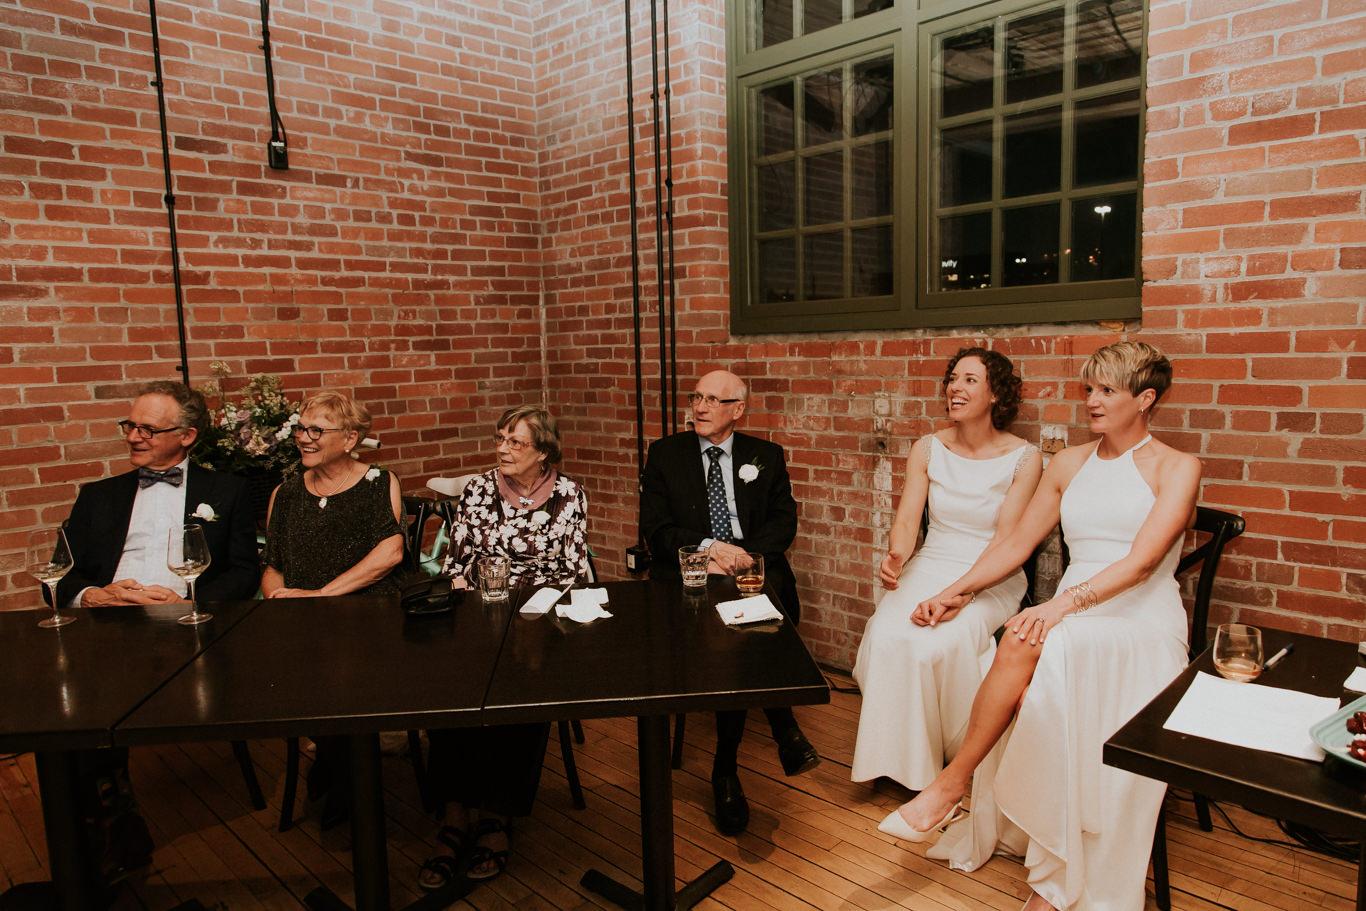 Lindsay-and-Heather-Charbar-Restaurant-Wedding-in-Calgary-203